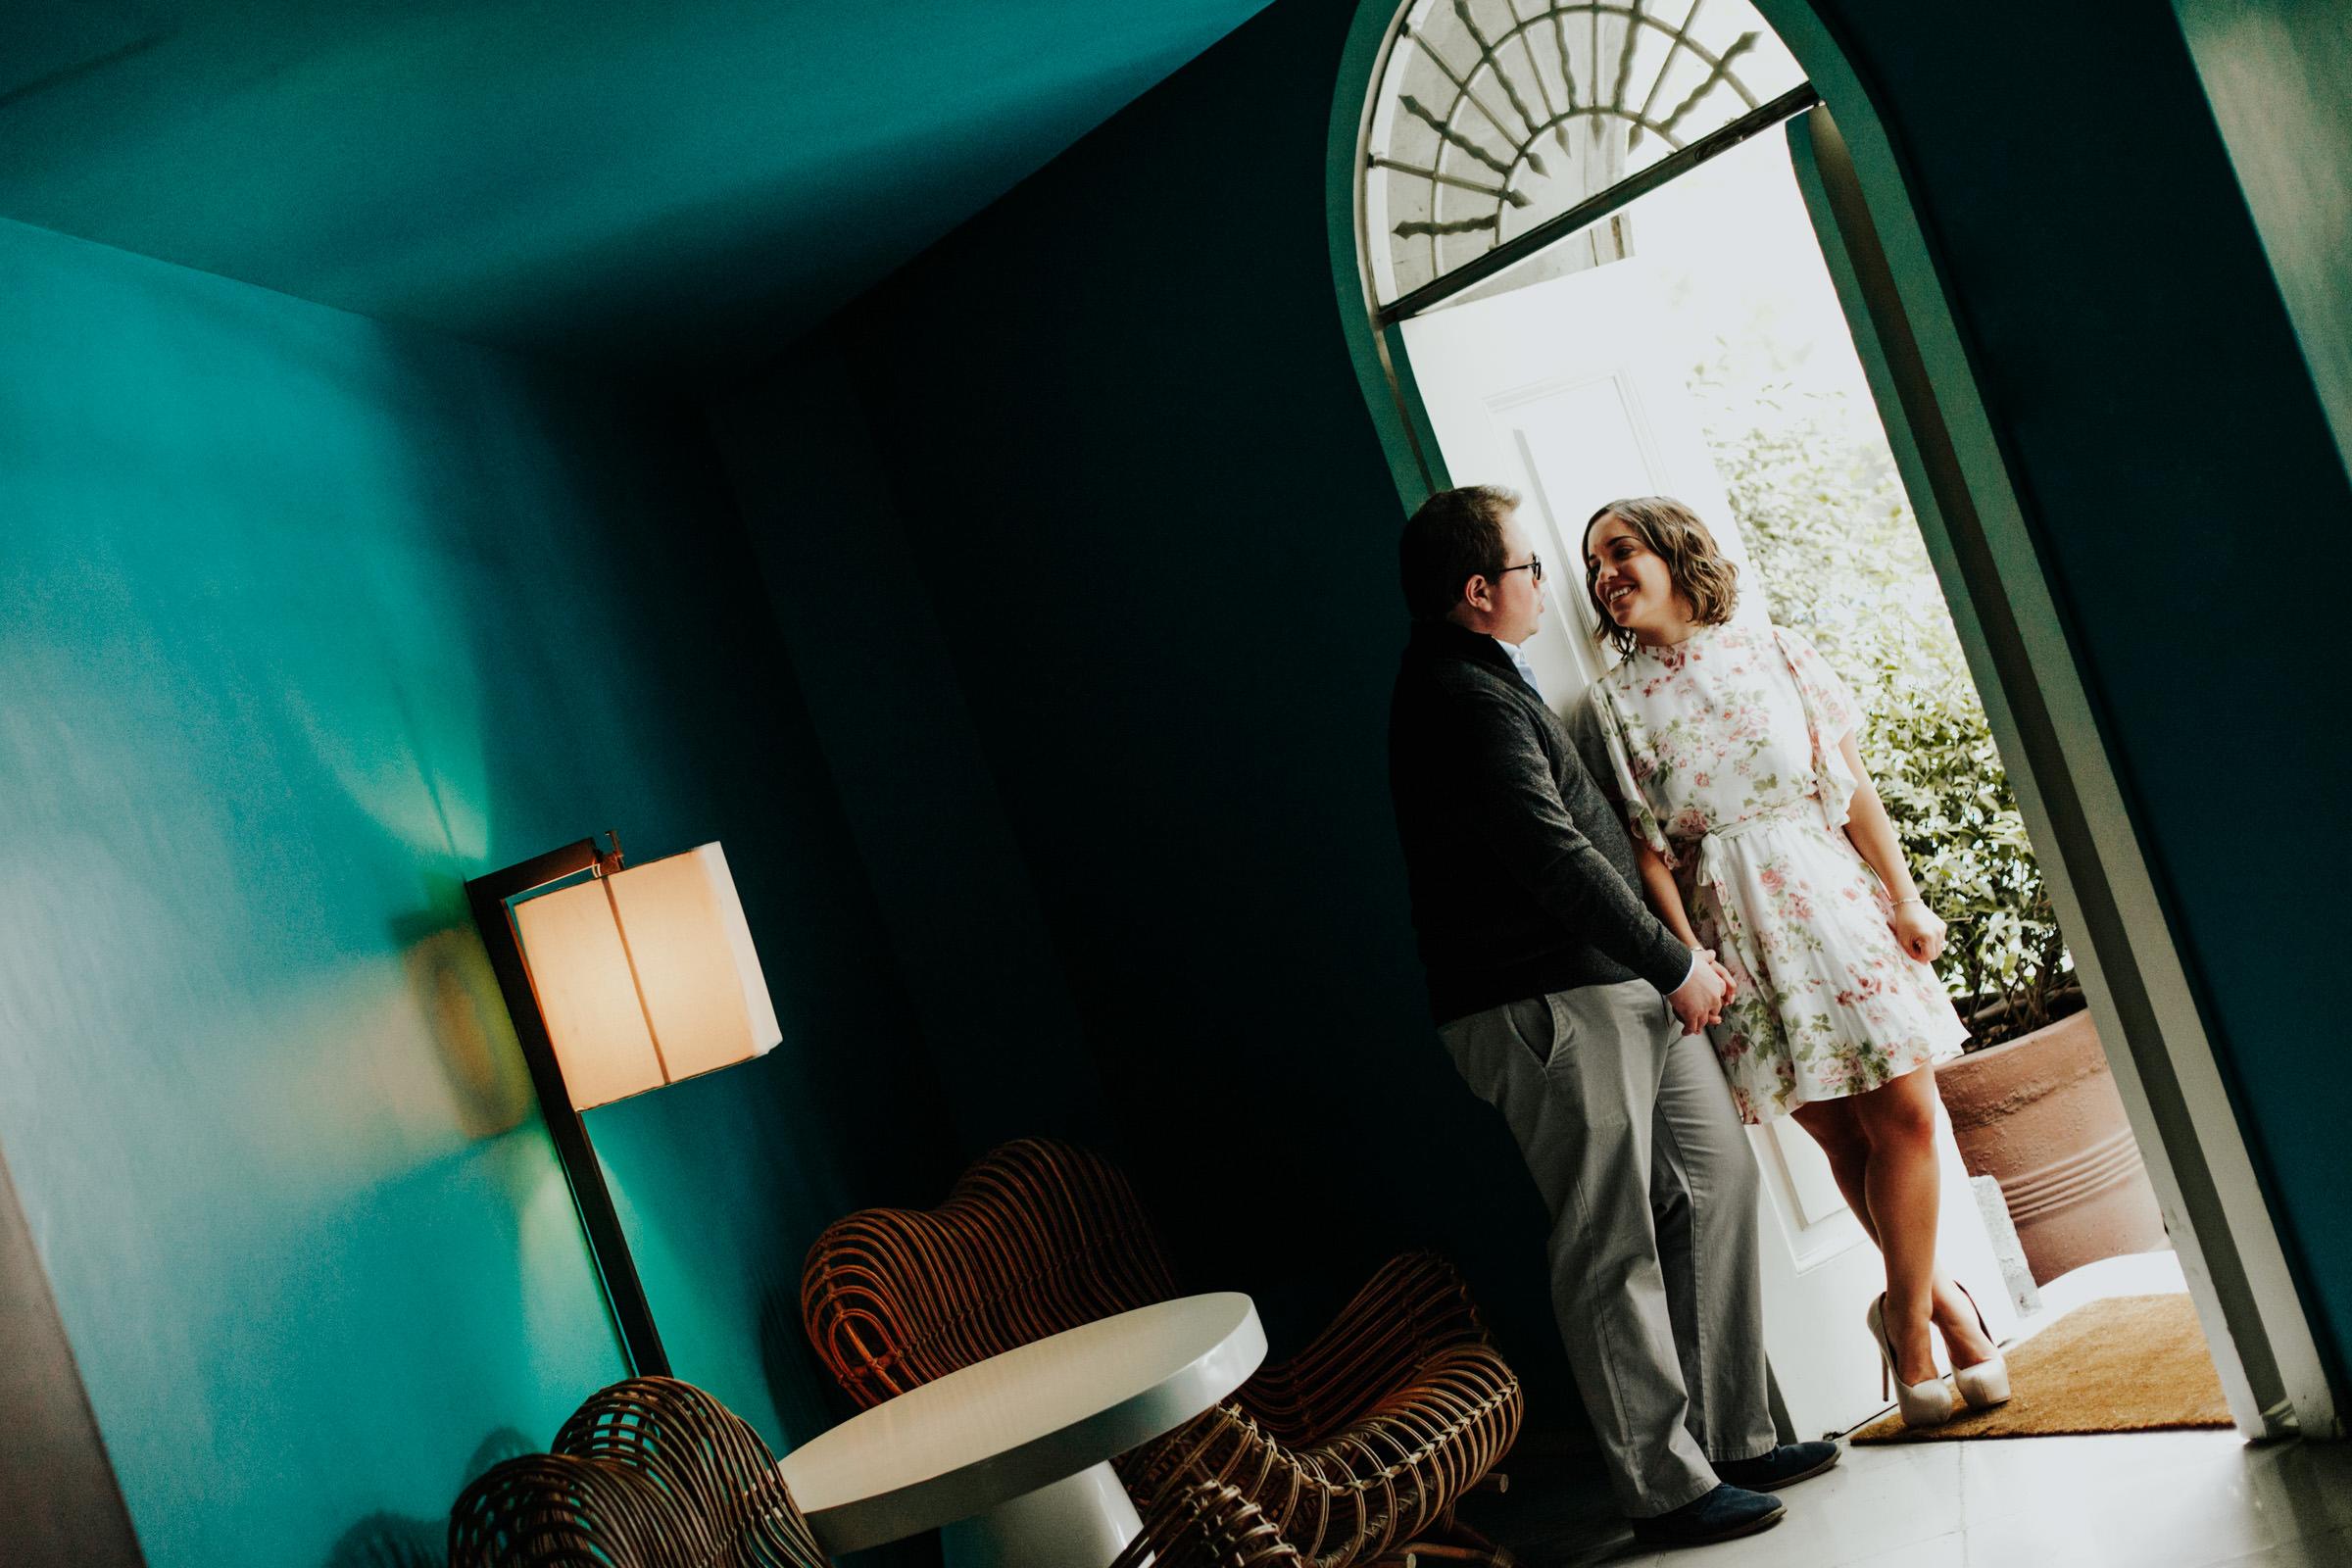 Fotografo-Boda-Hotel-Condesa-DF-Mexico-CDMX-Photography-Wedding-Pierce-79.jpg